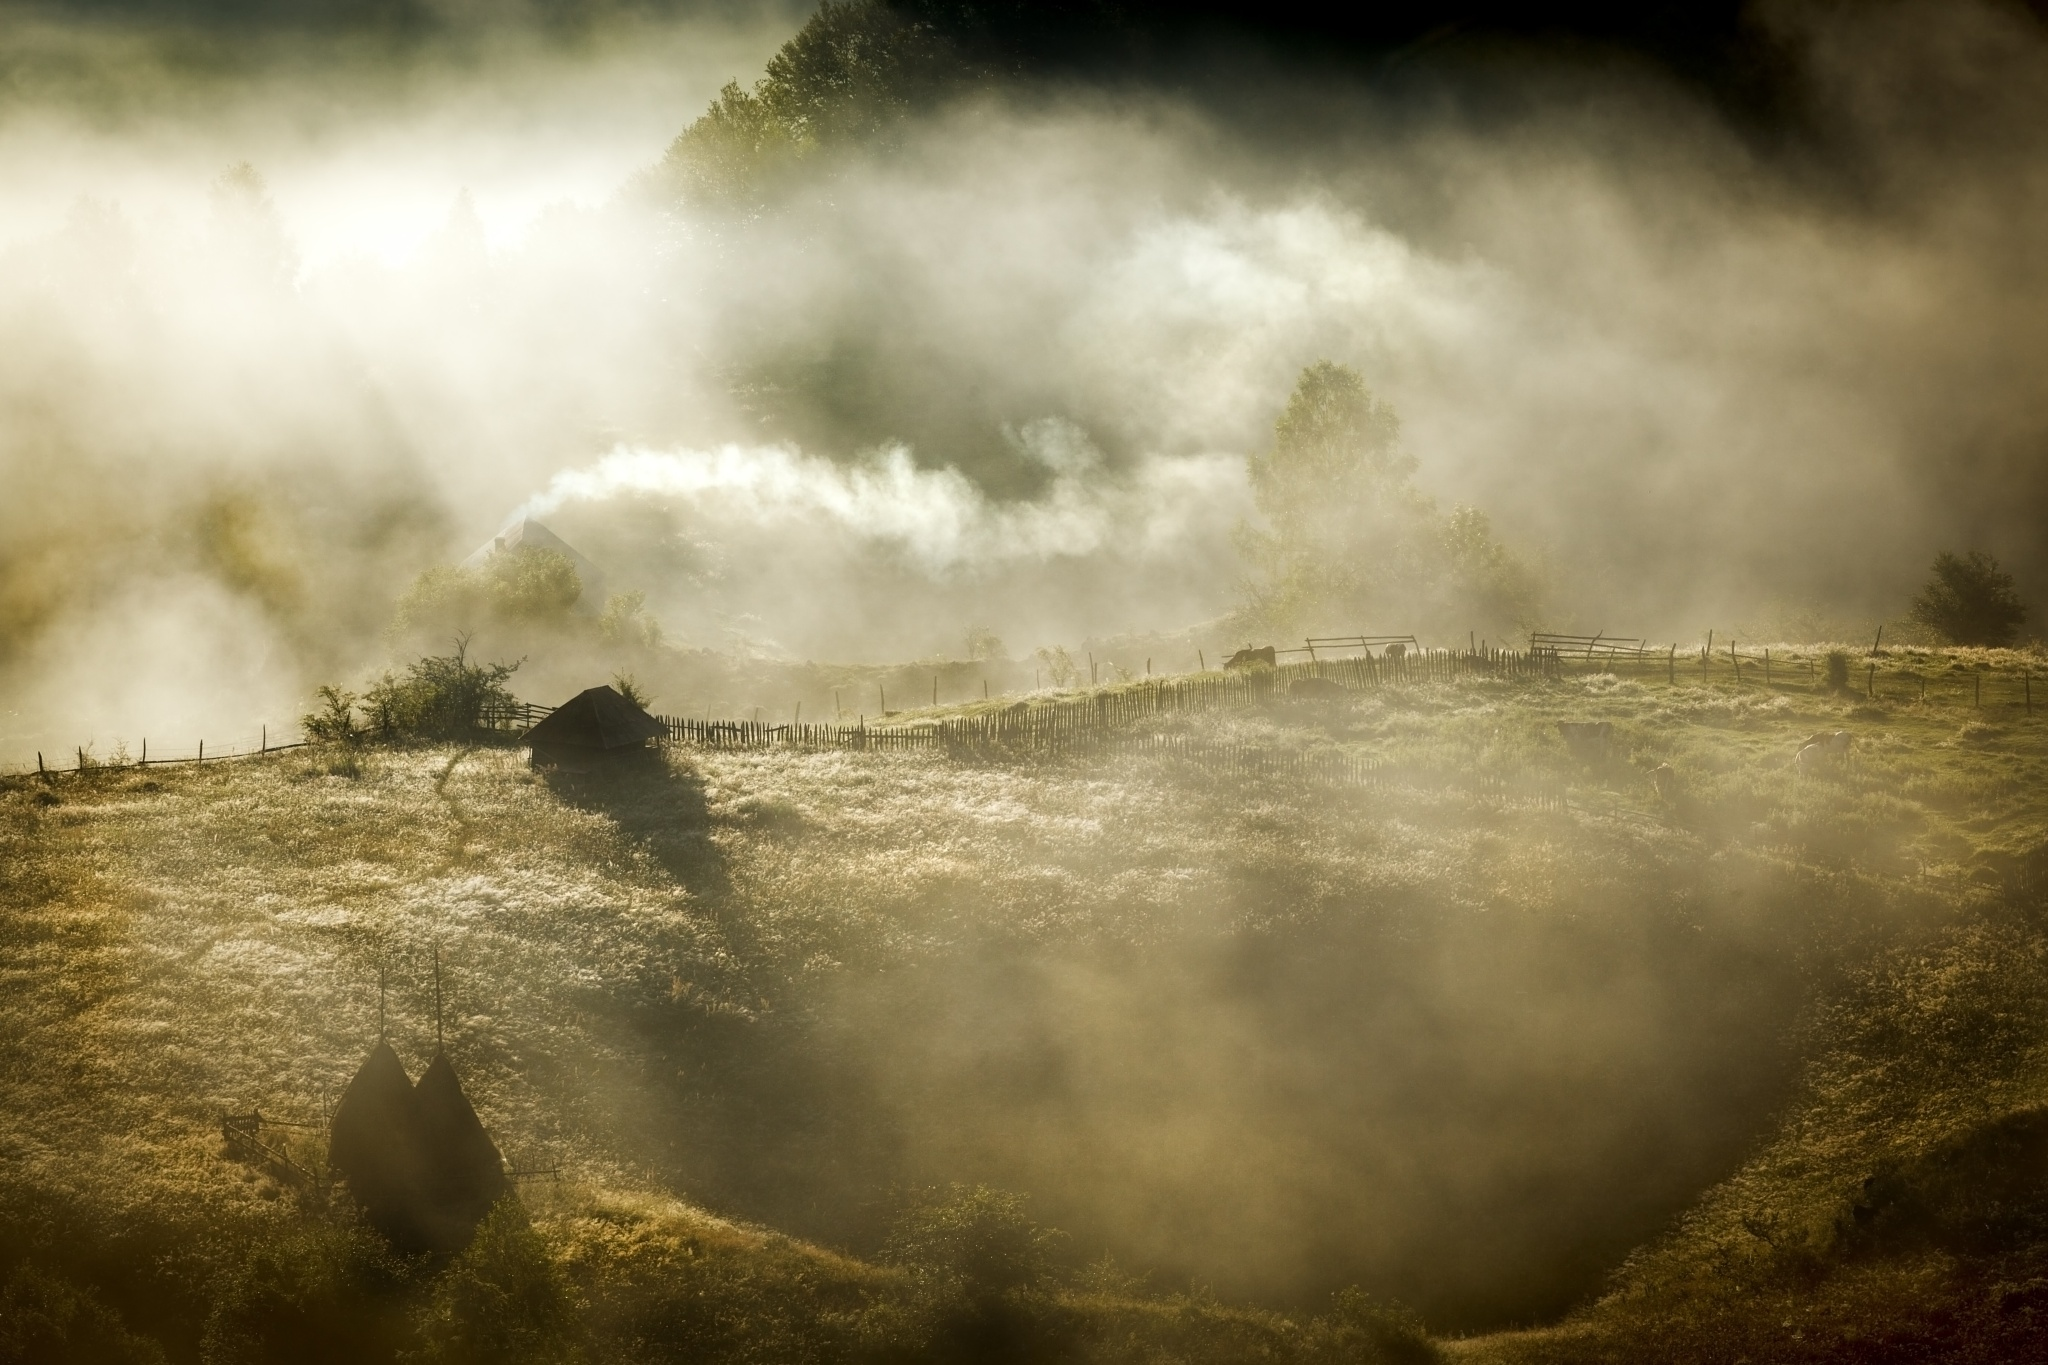 Misty morning by Hamos Gyozo